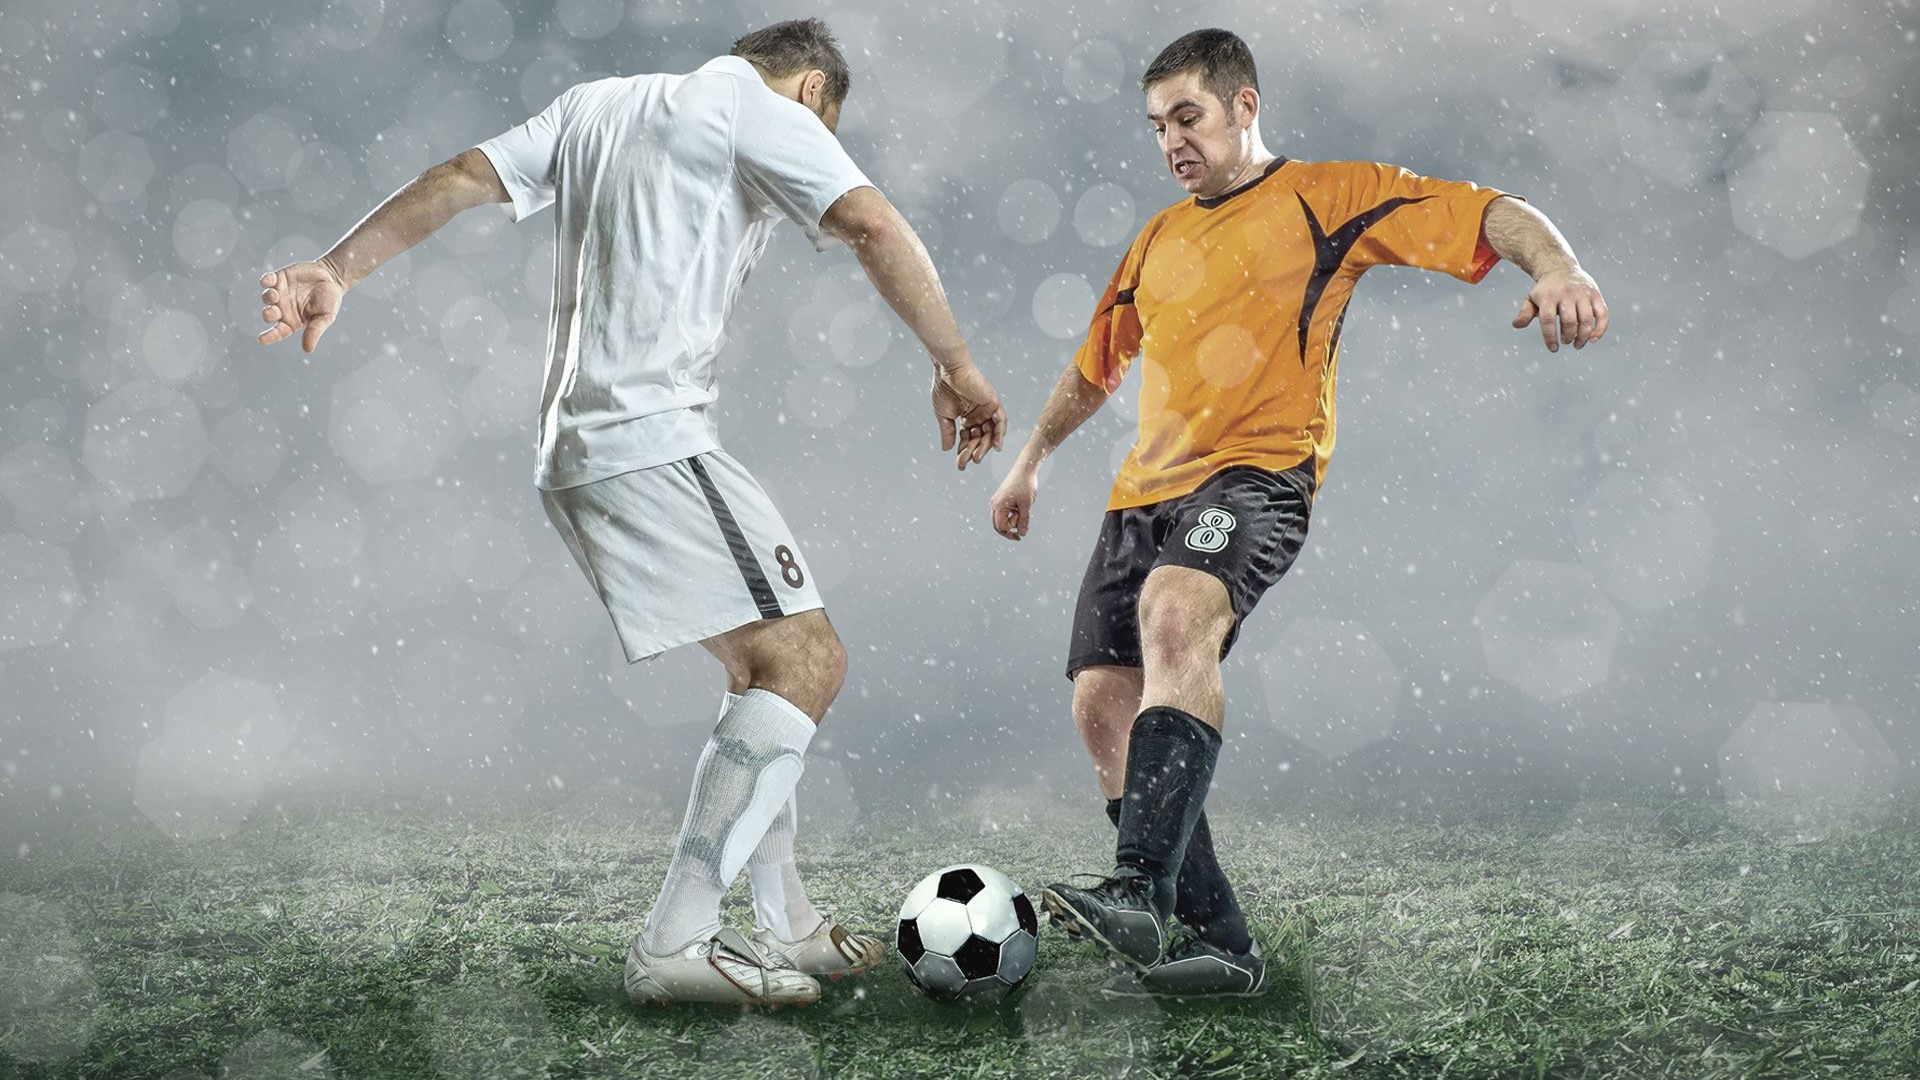 watch-catalans-dragons-vs-huddersfield-giants-live